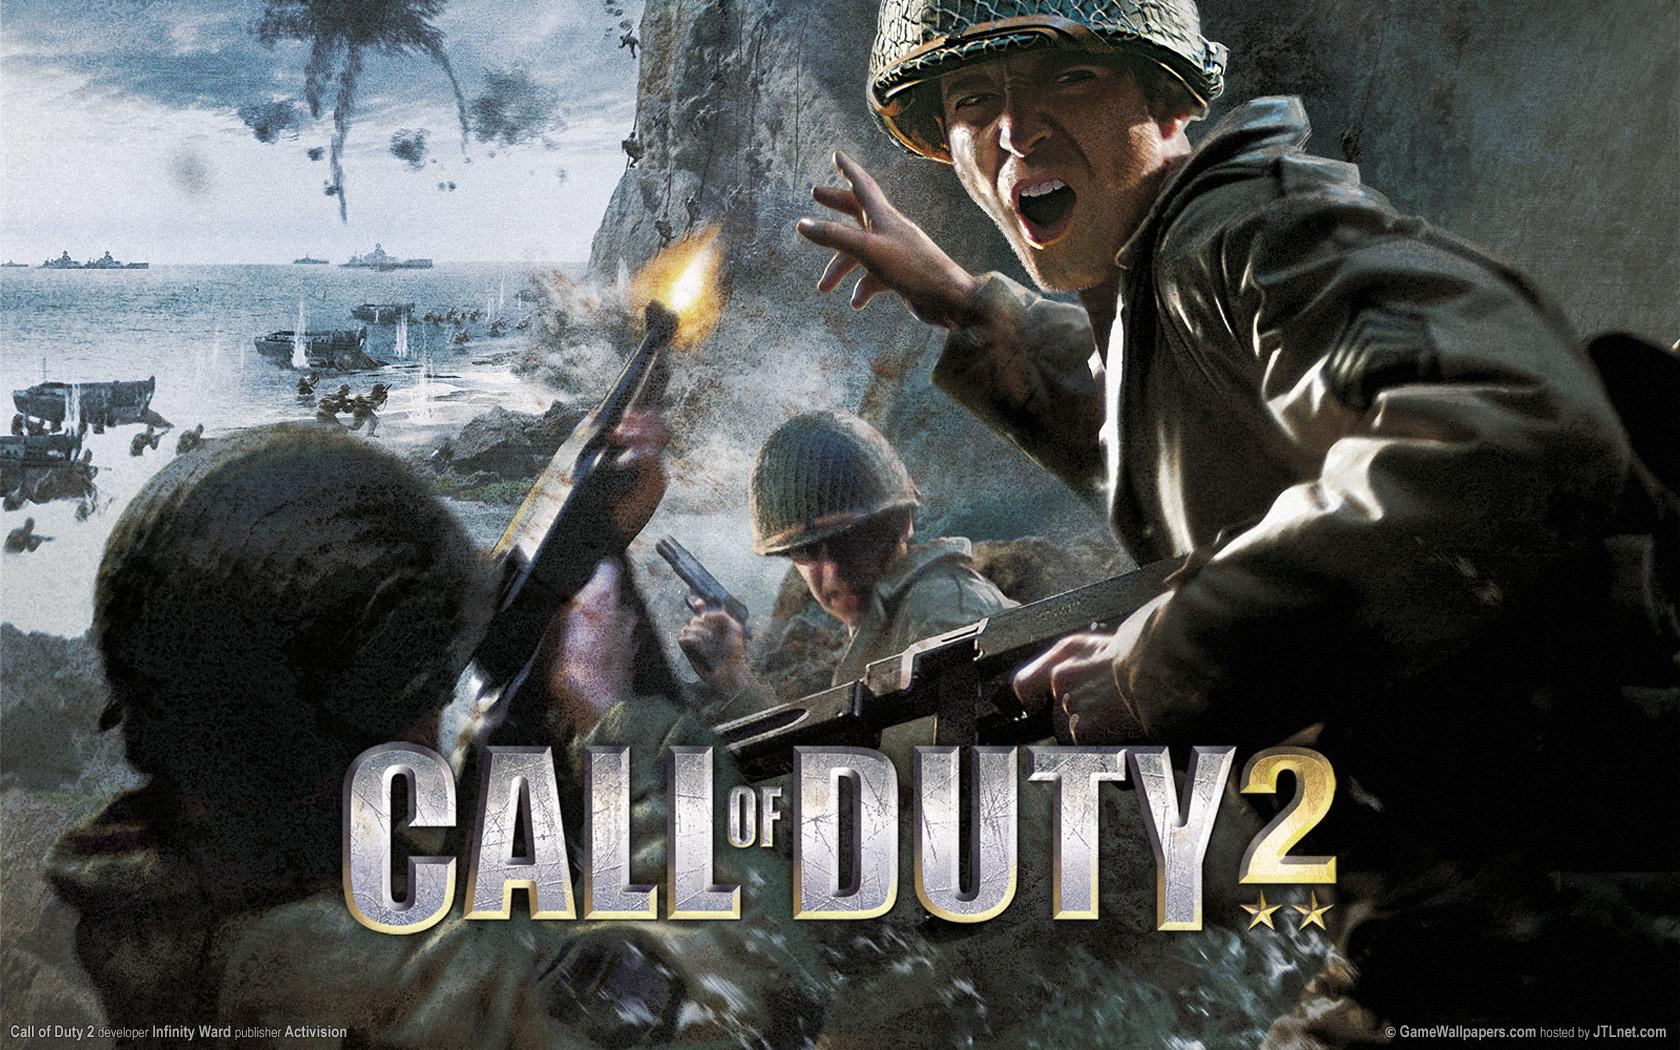 1680x1050 Call of Duty 2 desktop PC and Mac wallpaper 1680x1050